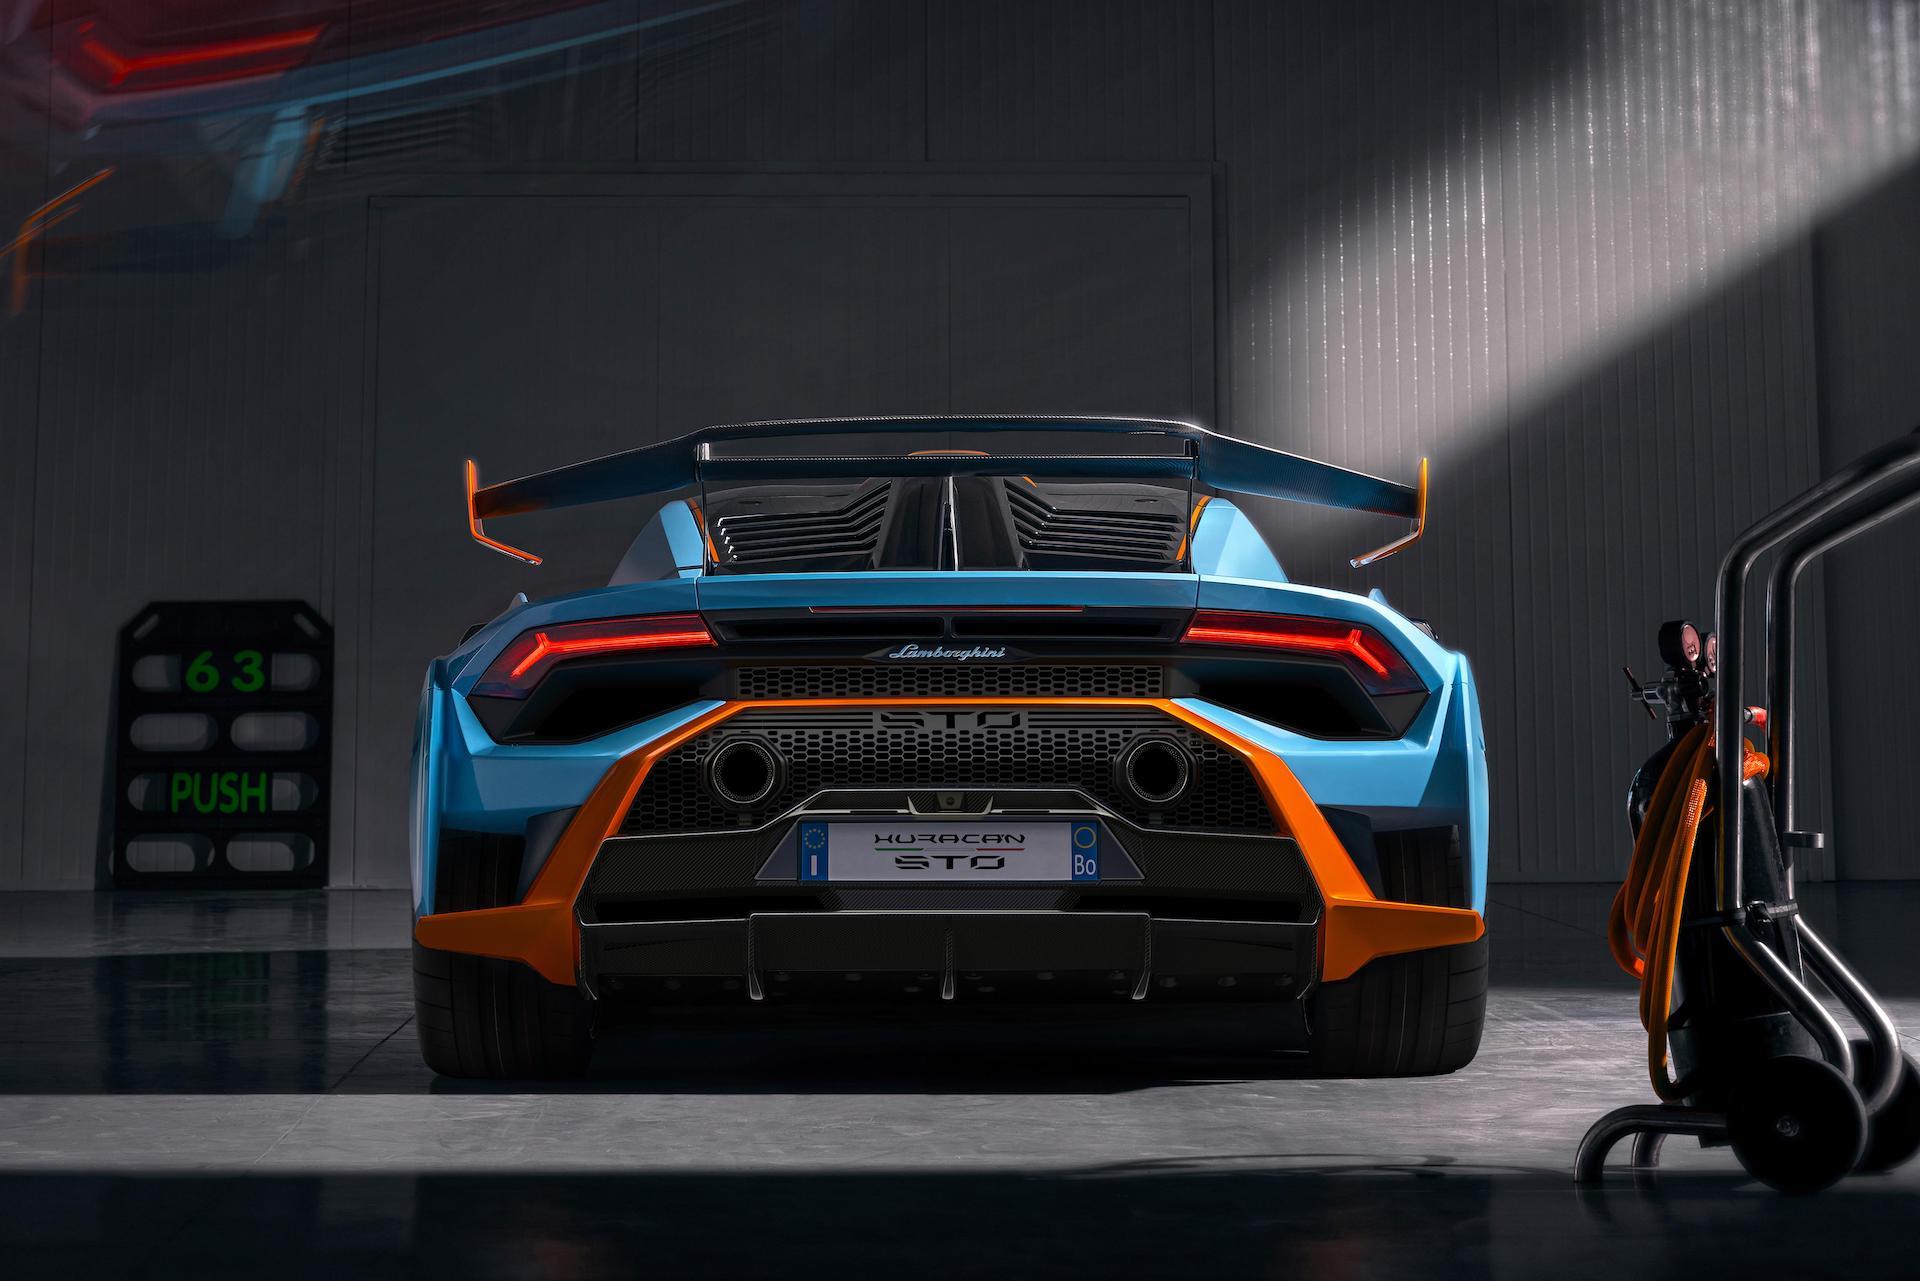 Der neue Lamborghini STO: Die Inkarnation des Squadra Corse-Erbes 2